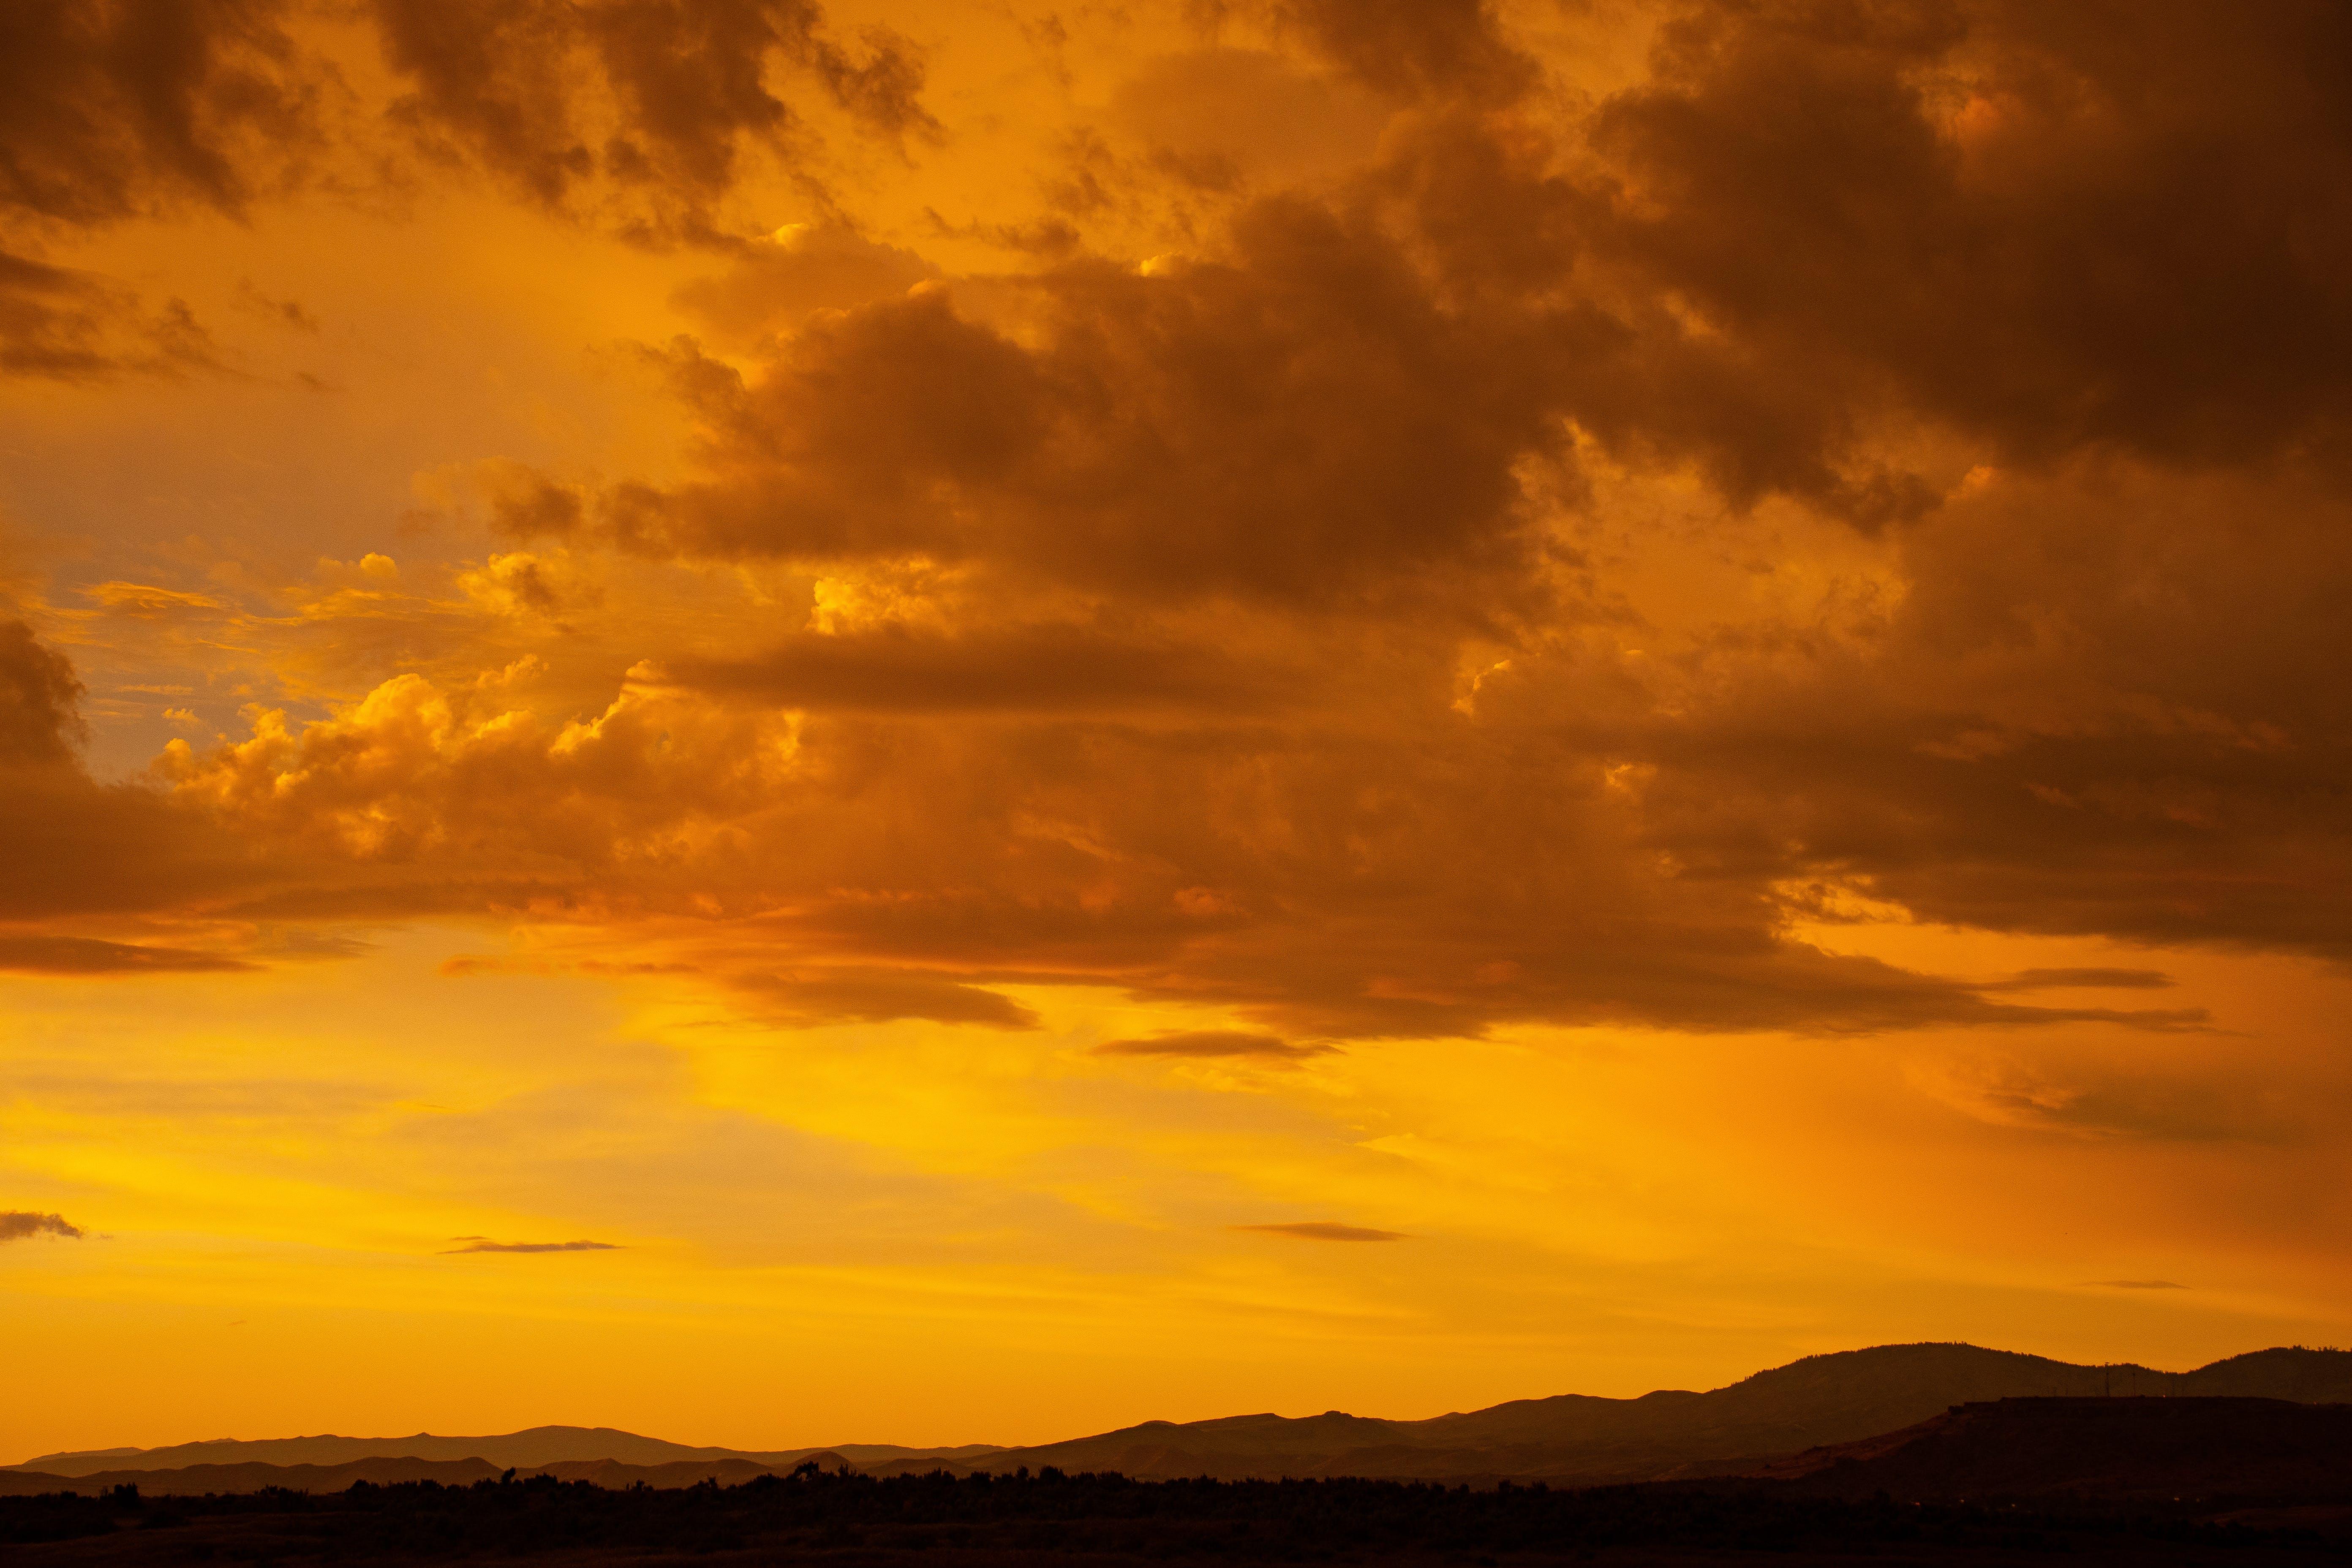 Sunset Under Cloudy Sky